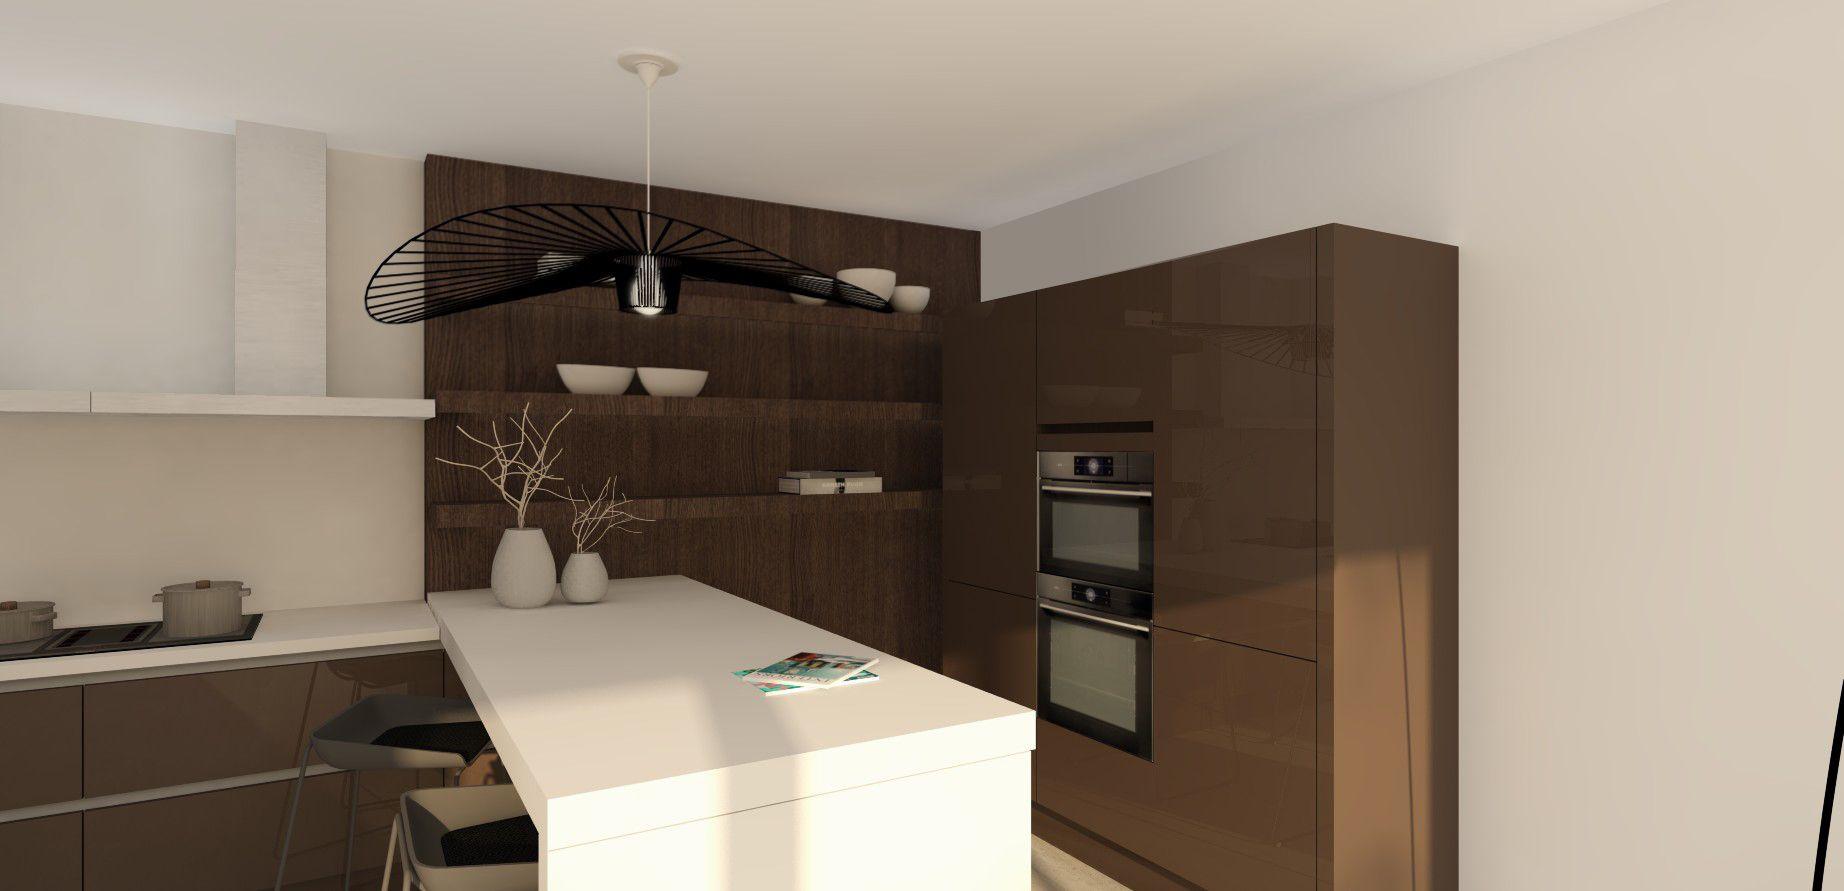 Unieke SieMatic eiland keuken